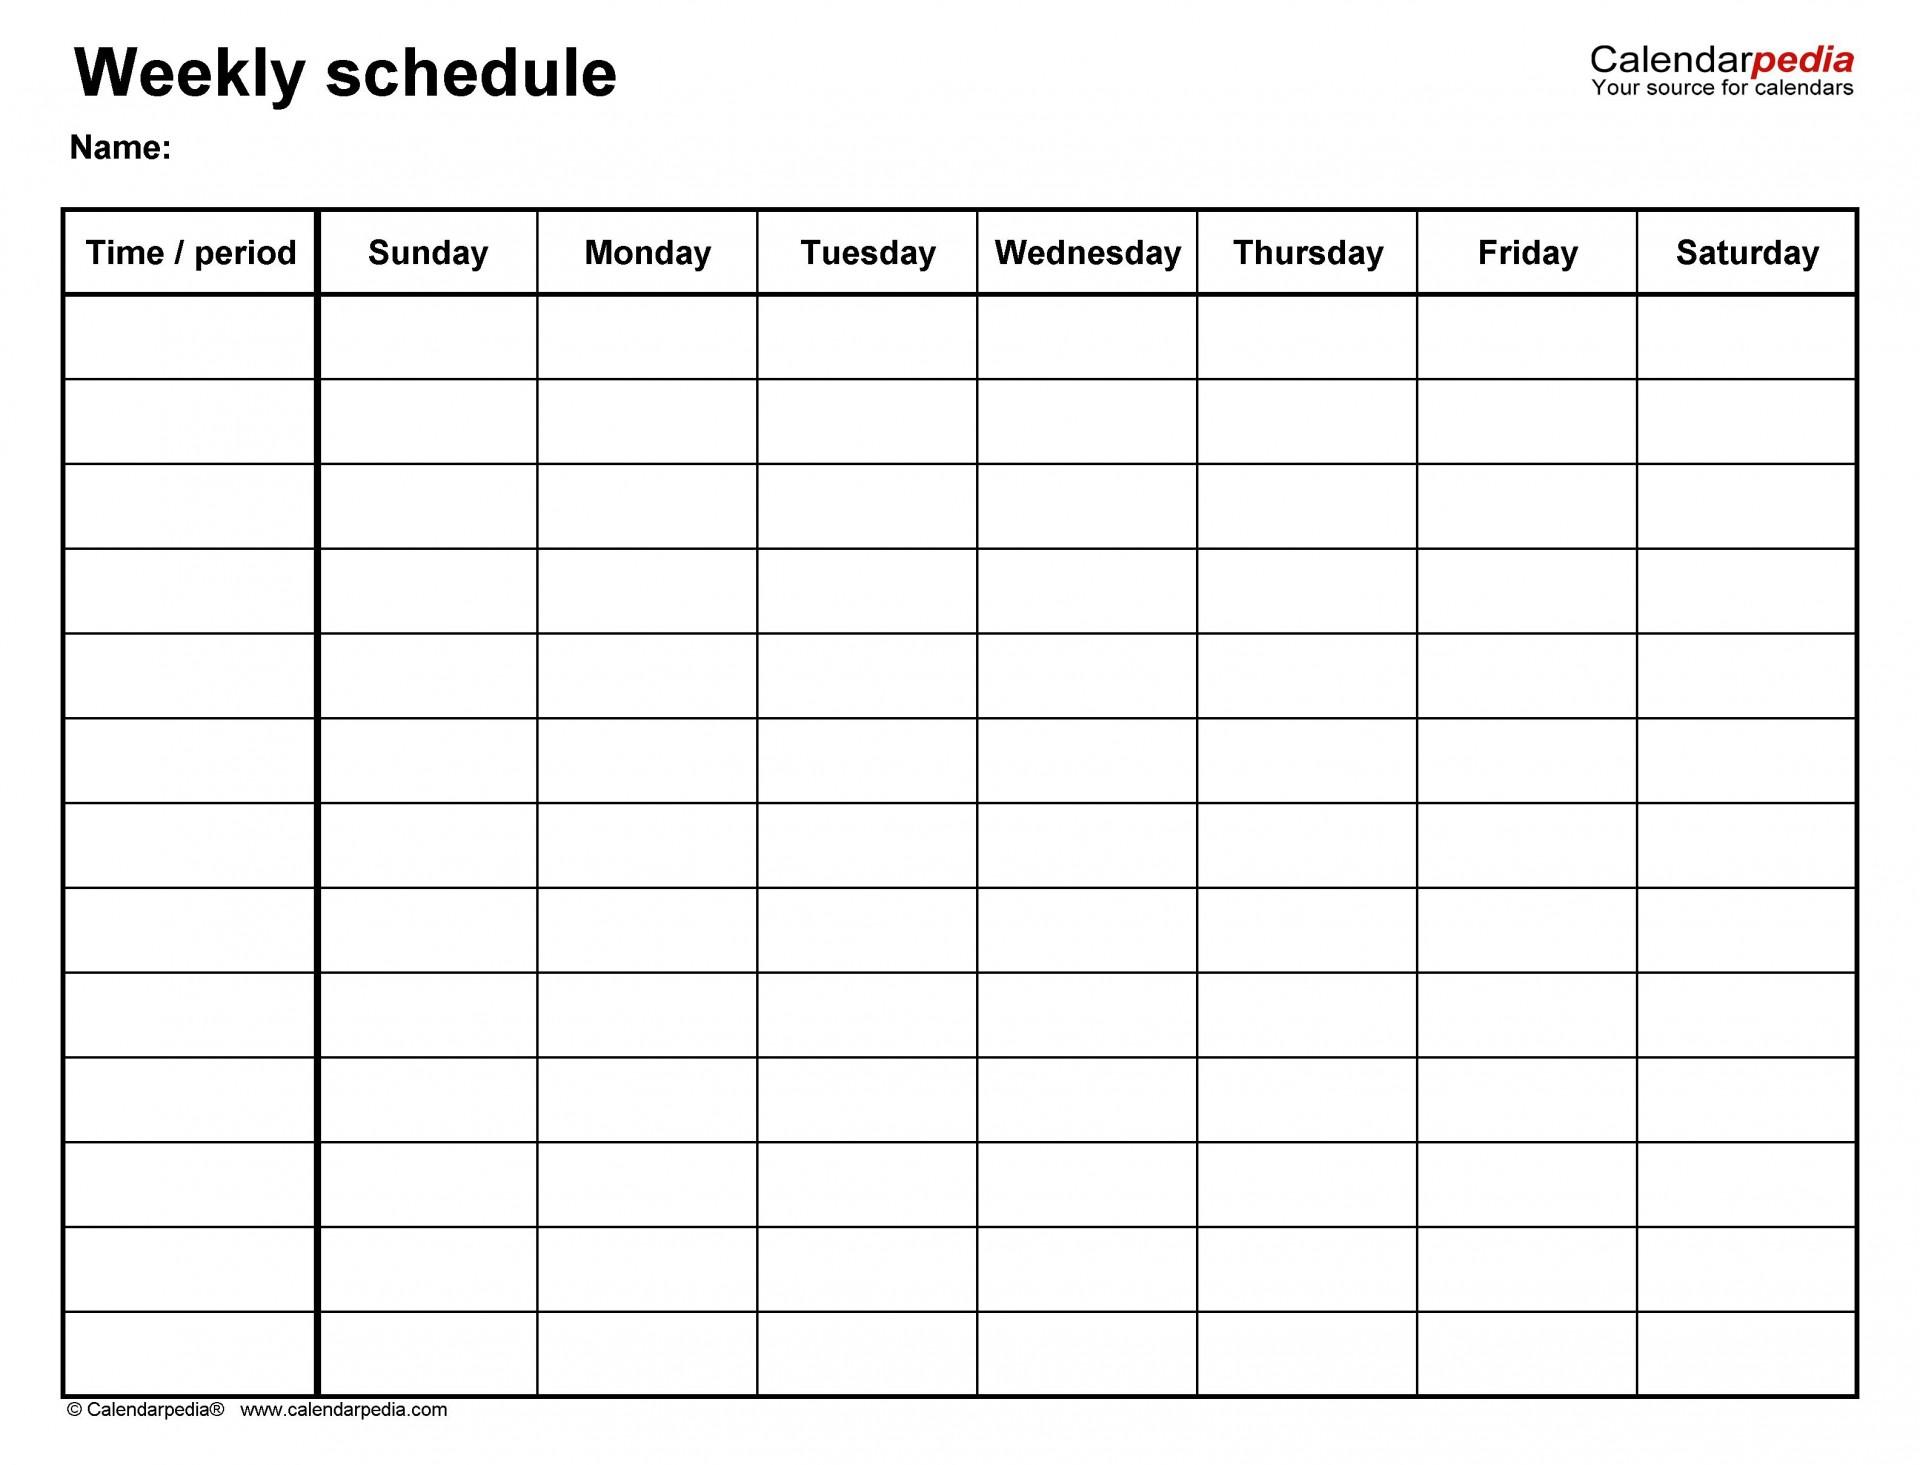 008 Unusual Weekly Schedule Template Word Inspiration  Work Microsoft Plan1920